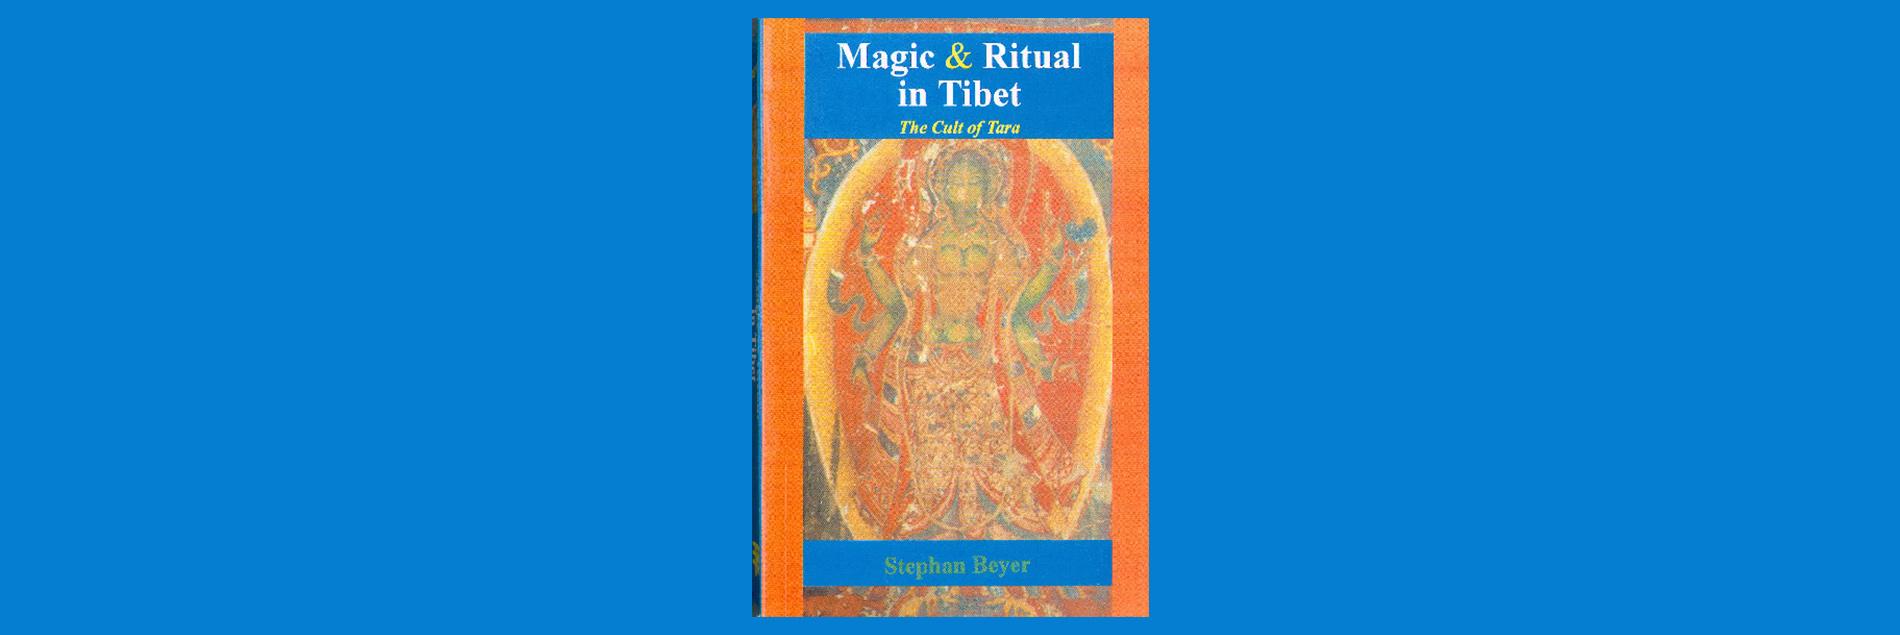 Magic and ritual in Tibet. The cult of Tara